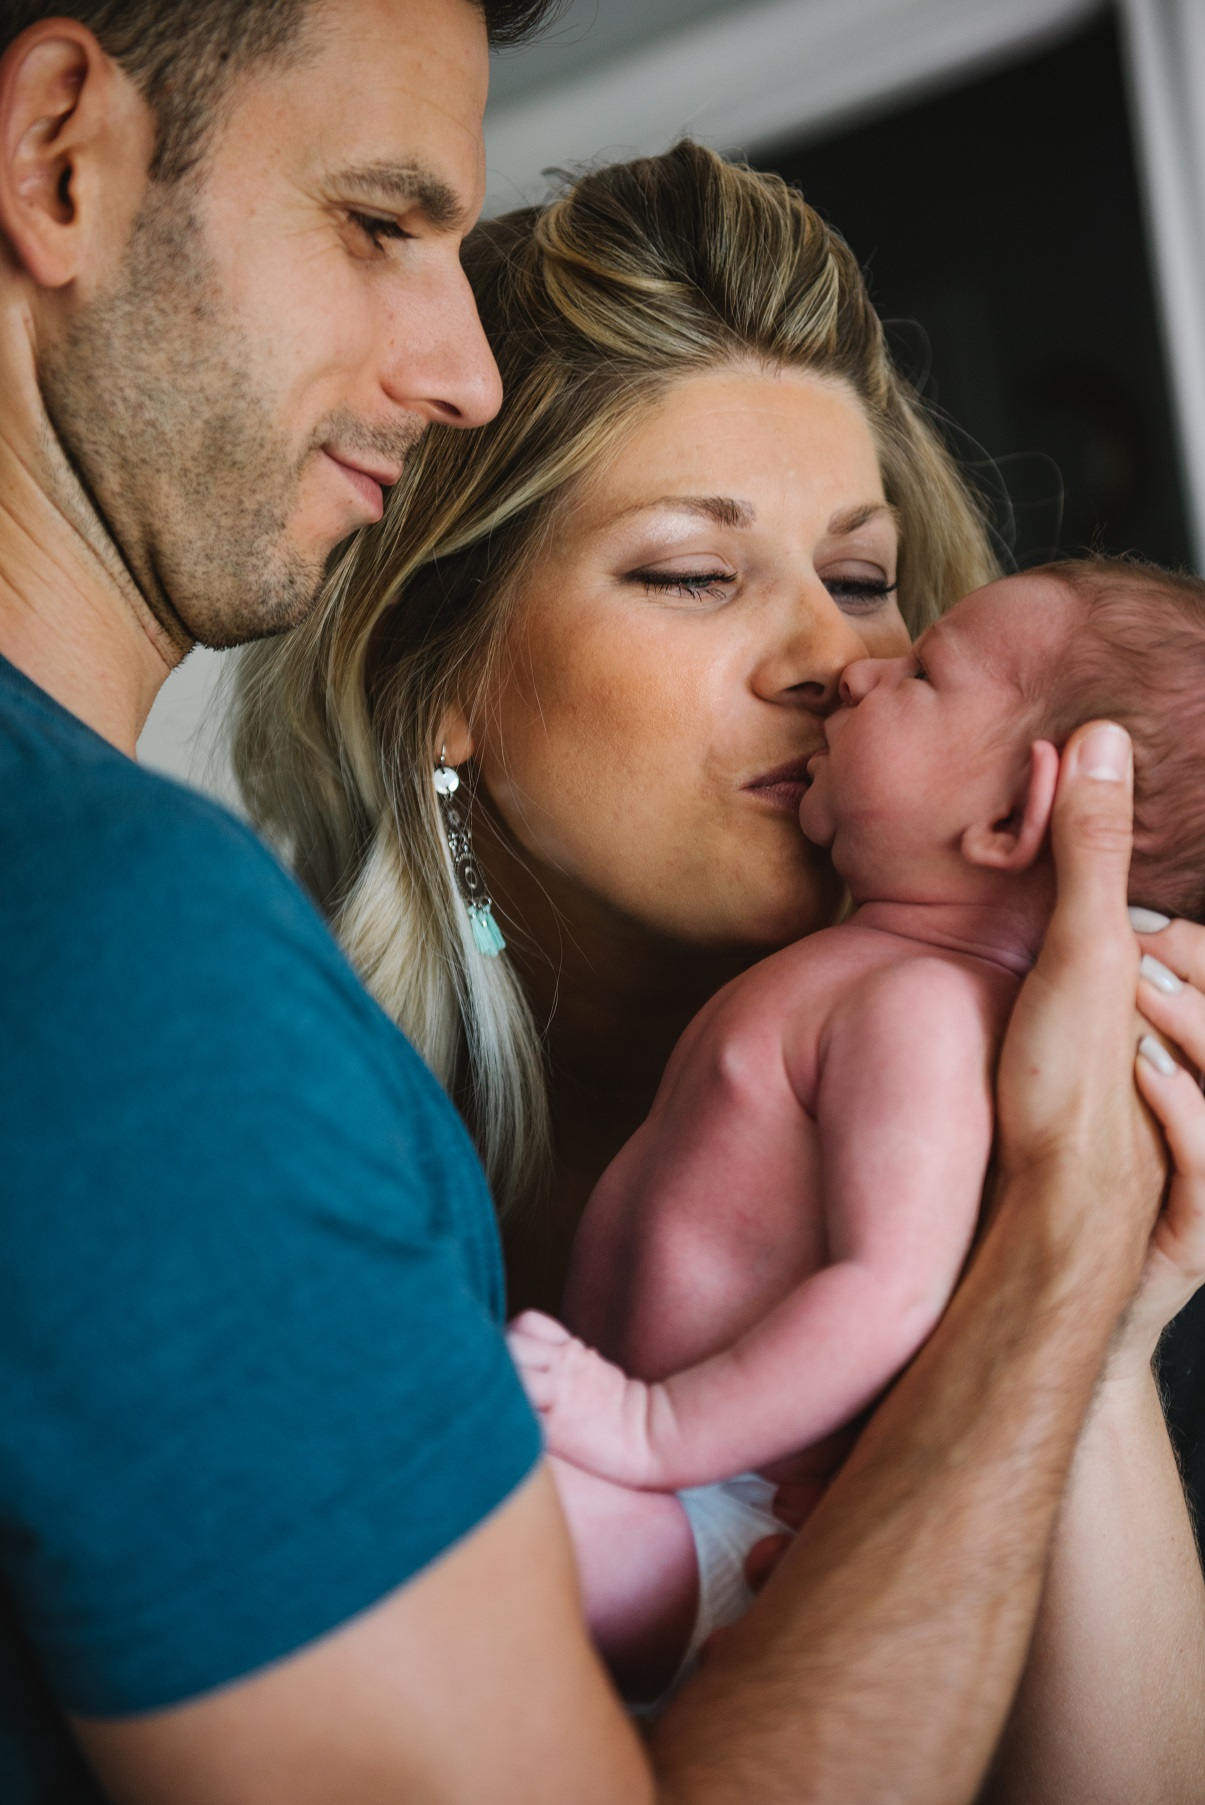 atlas newborn photoshoot 2 week old baby